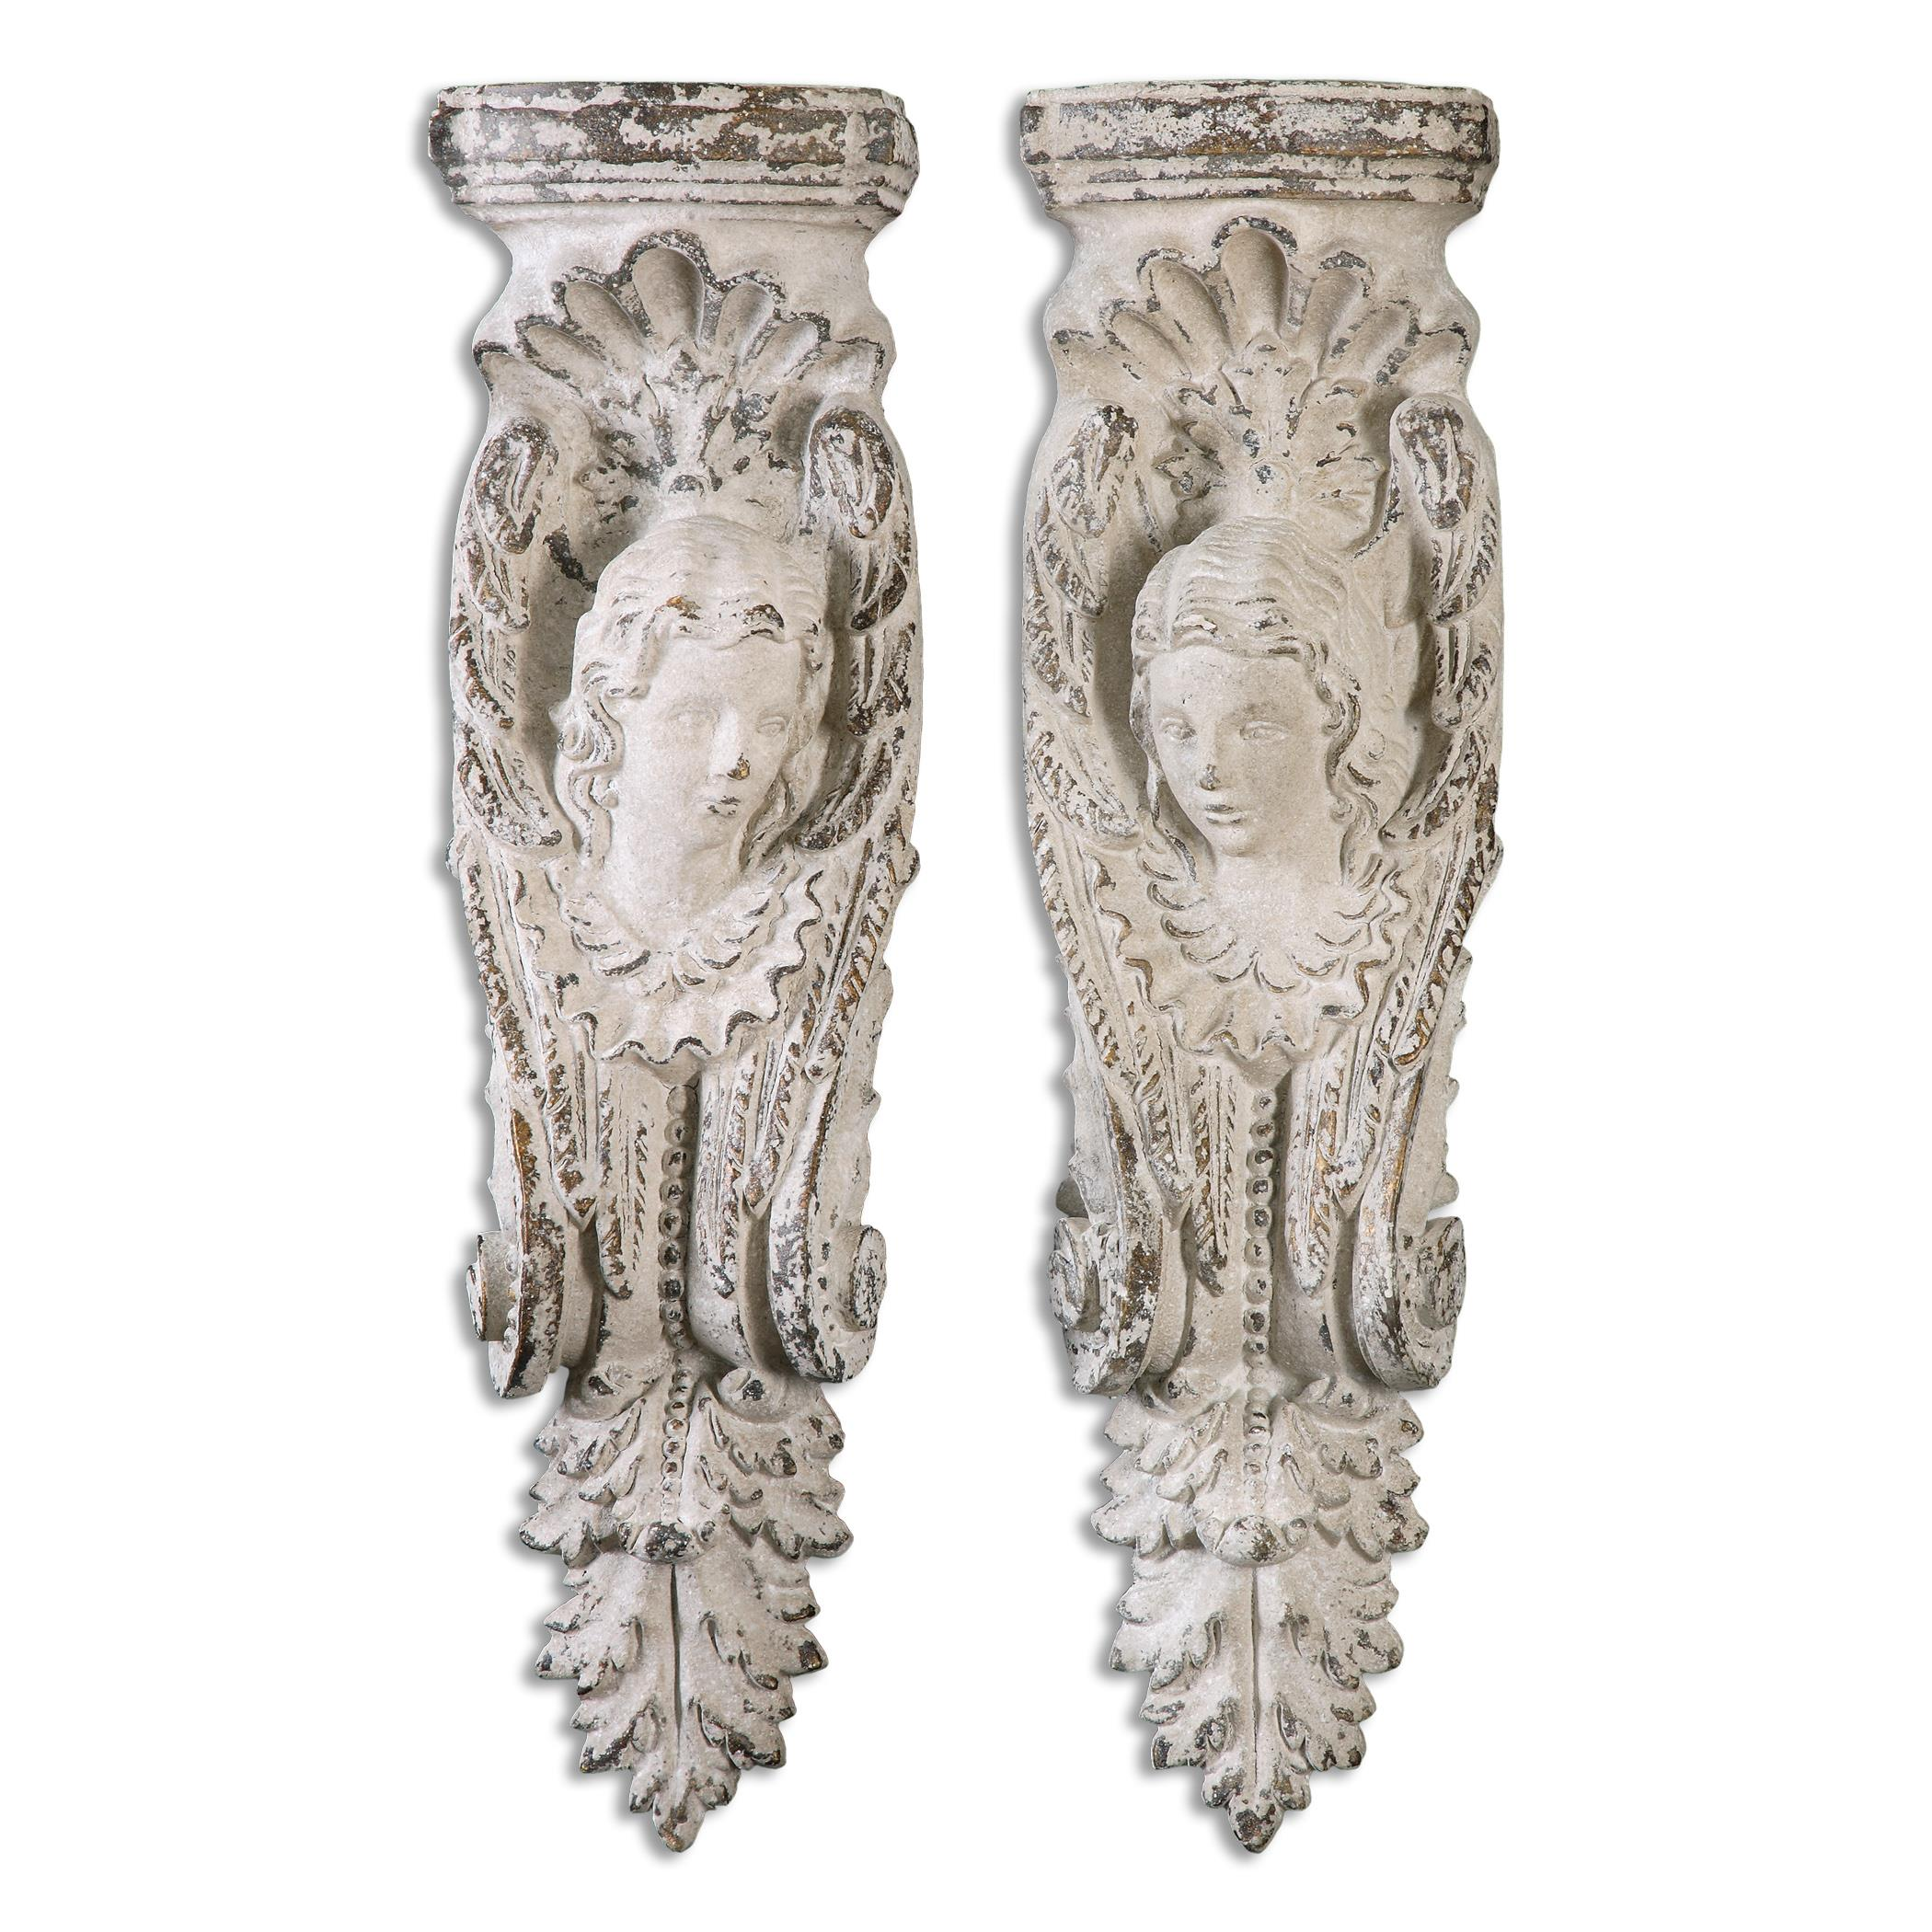 Uttermost Alternative Wall Decor Angelic Stone Ivory Shelves, S/2 - Item Number: 13909